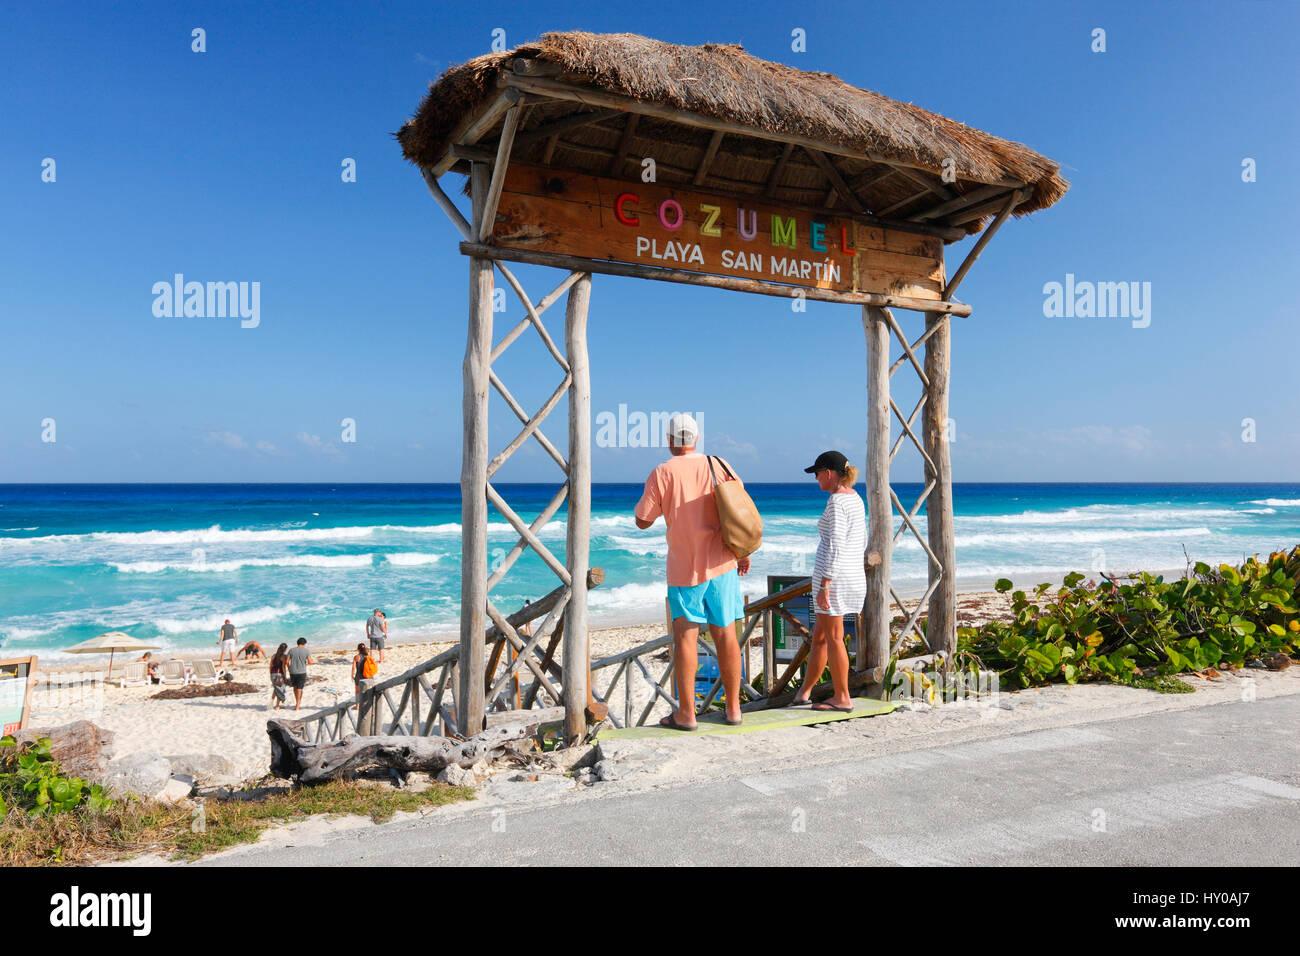 Cozumel San Martin beach - Stock Image